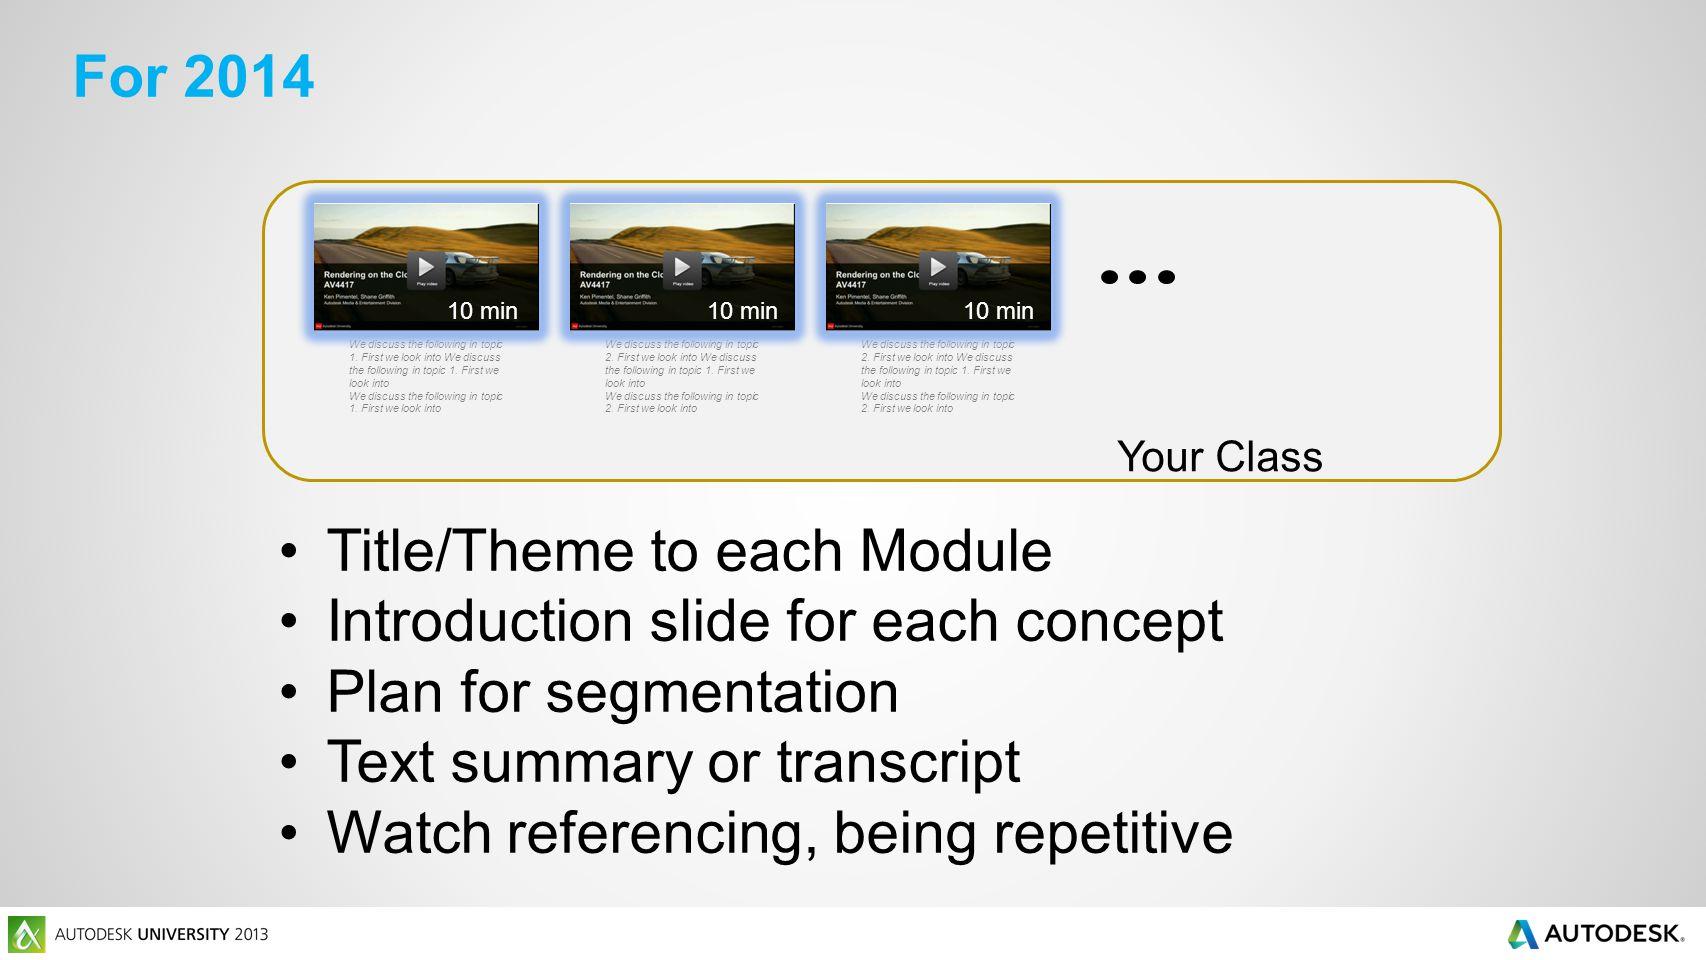 Module 1 Module 2 Module 3 We discuss the following in topic 1.